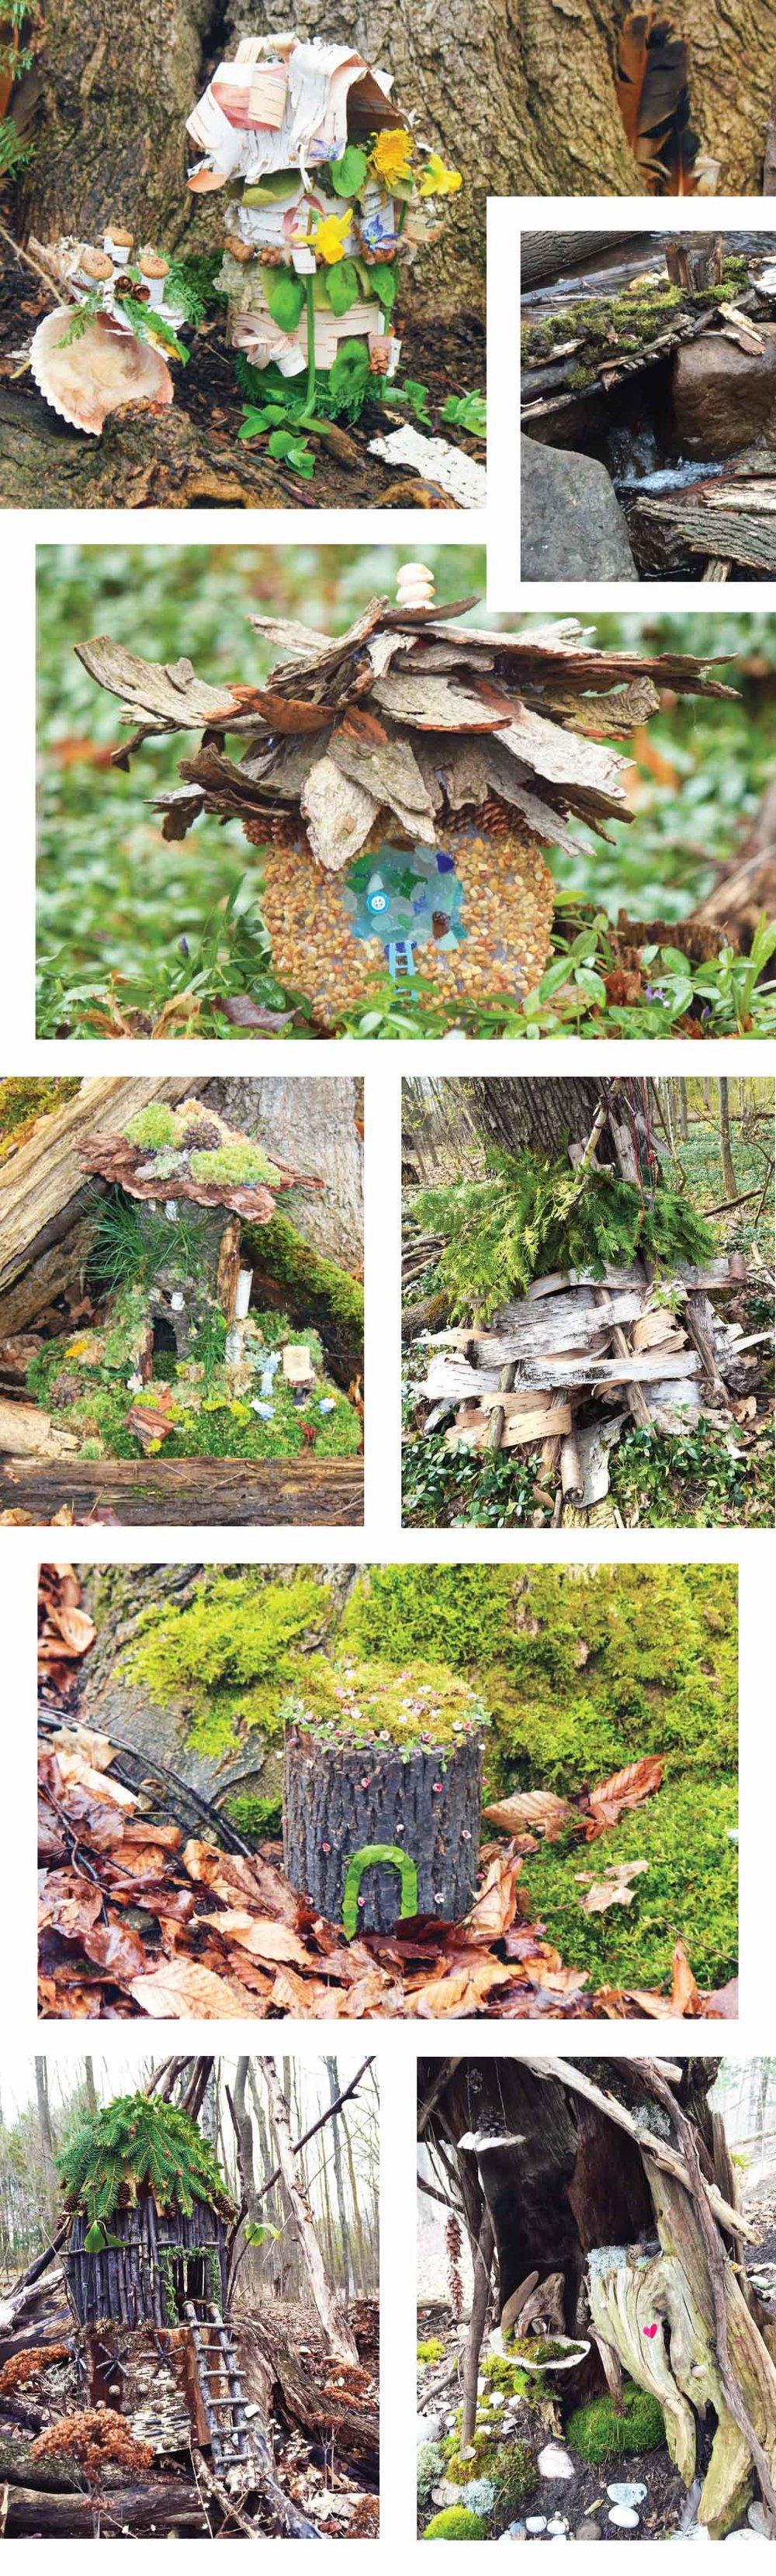 LifeandWhim-FairyTrailsHouses-1.jpg